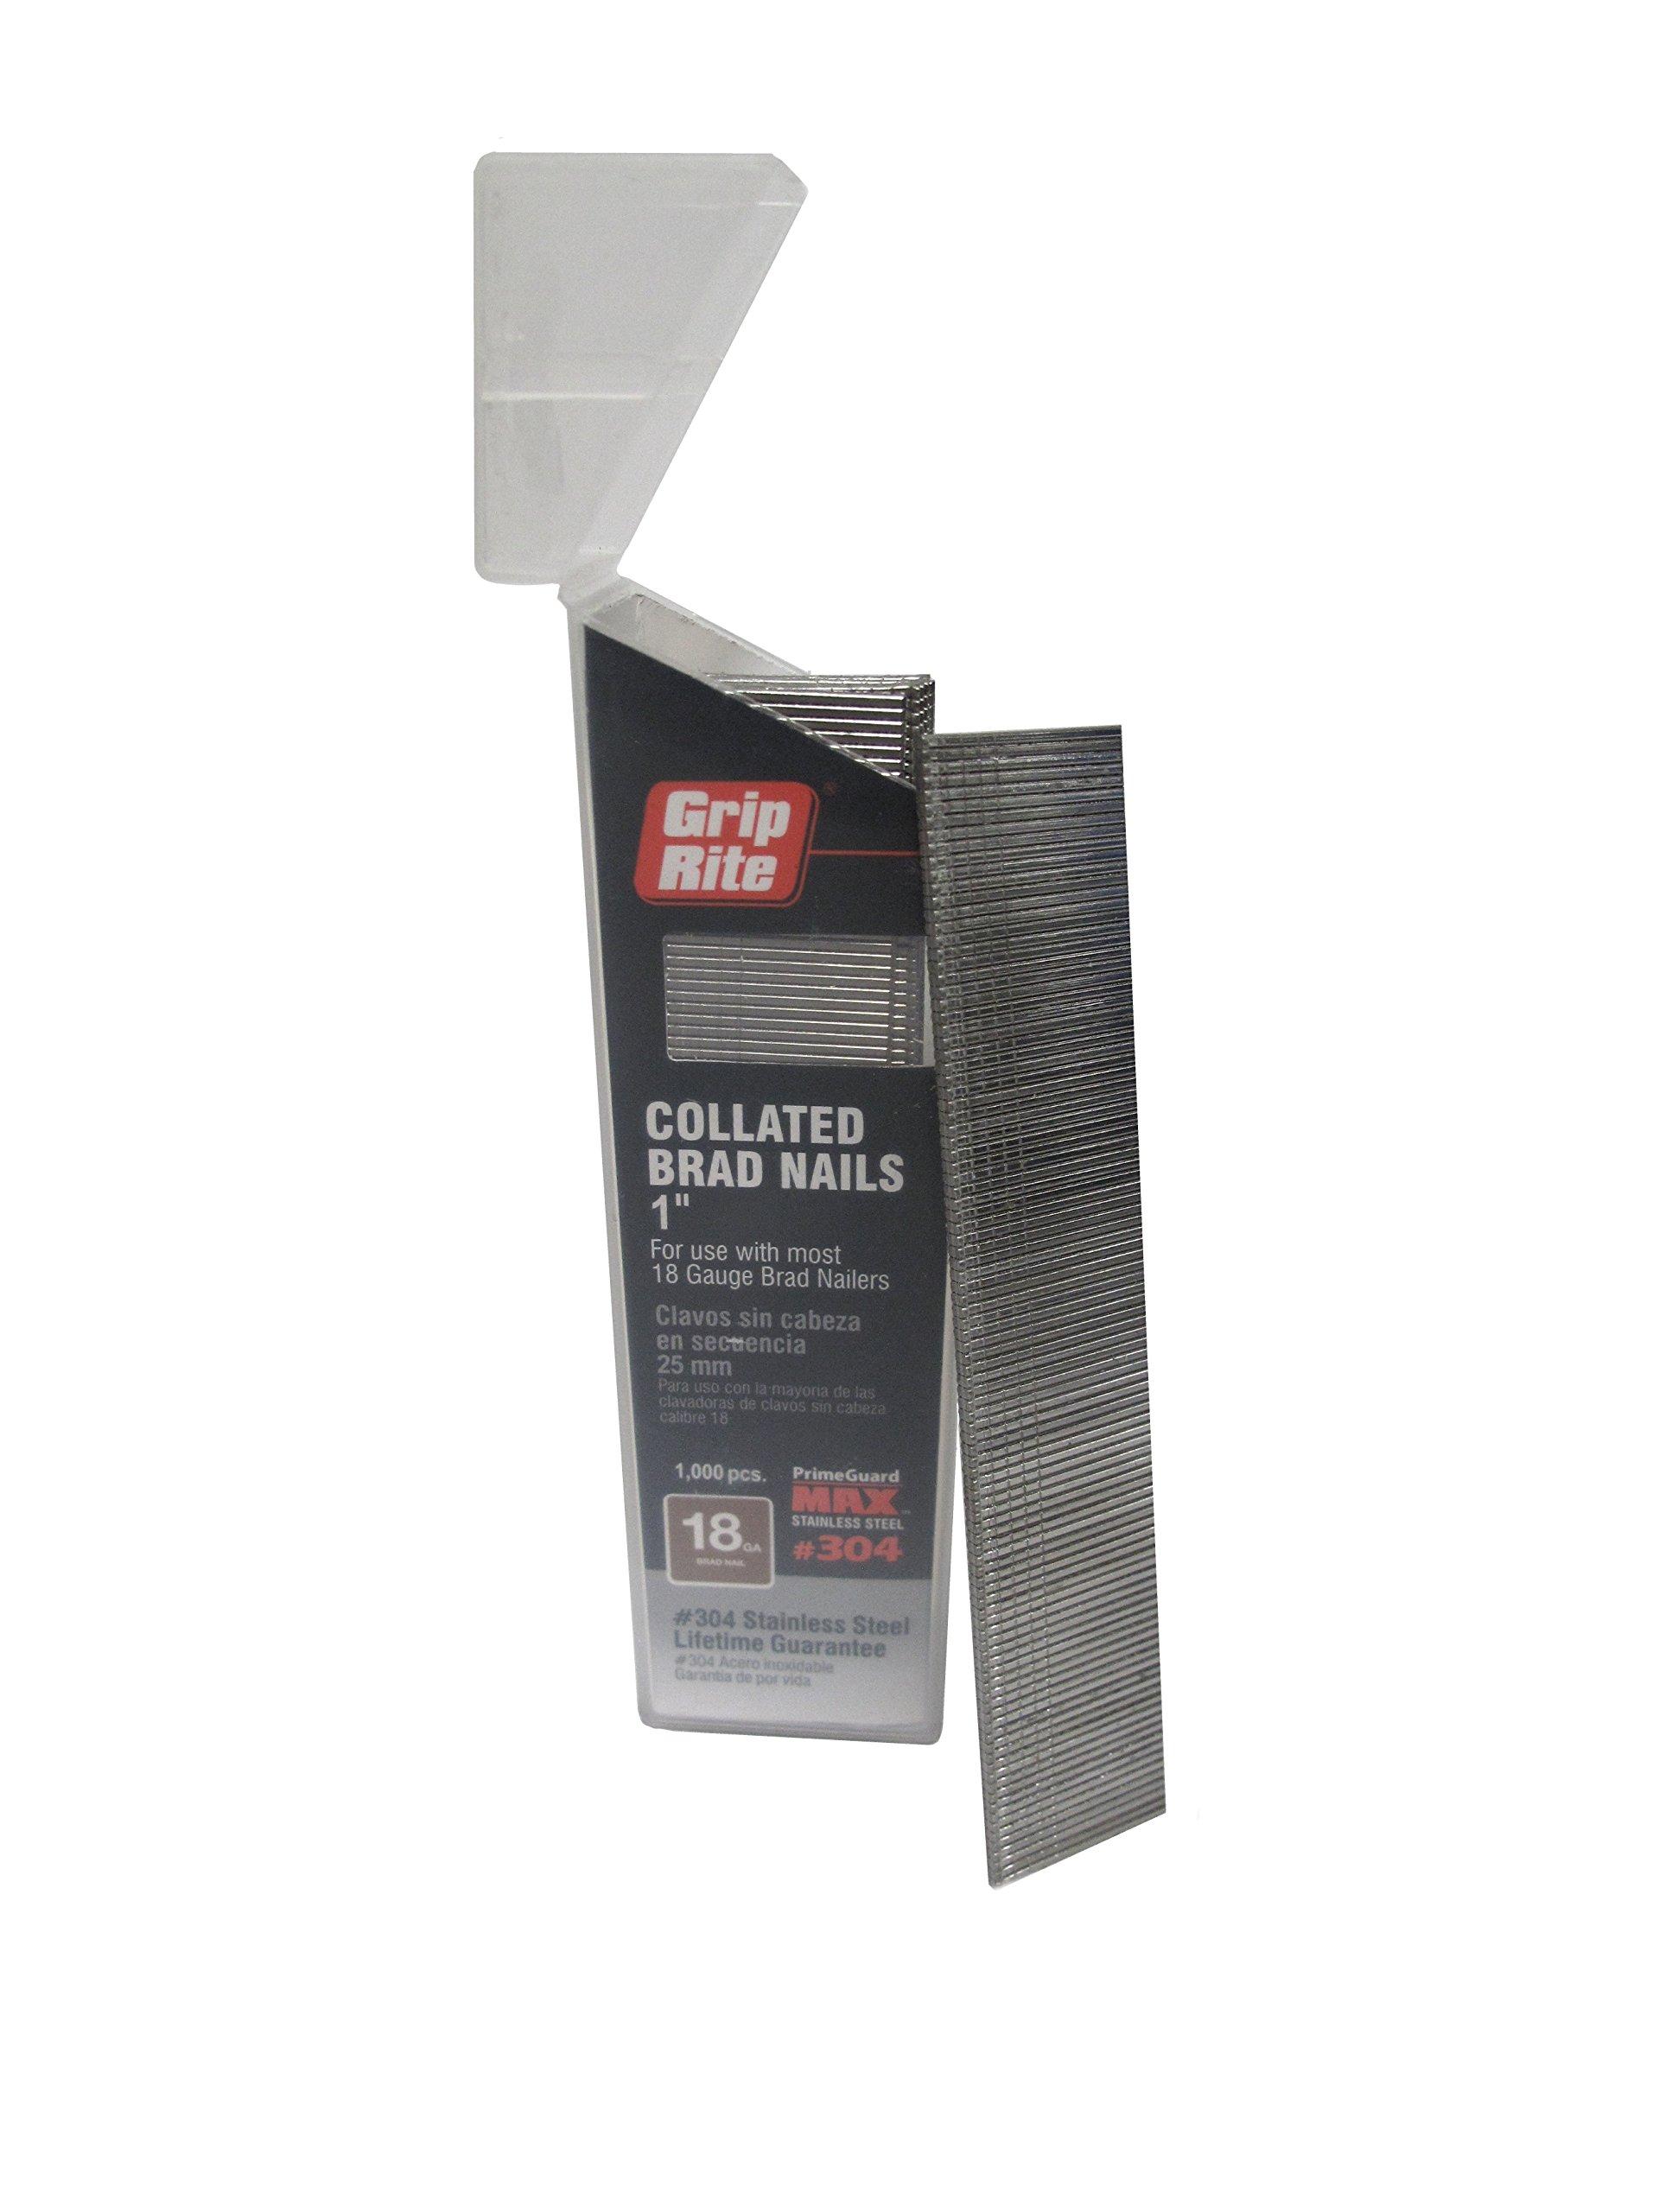 Grip Rite Prime Guard MAXB64875 18-Gauge 304-Stainless Steel Brad Nails in Belt-Clip Box (Pack of 1000), 1''